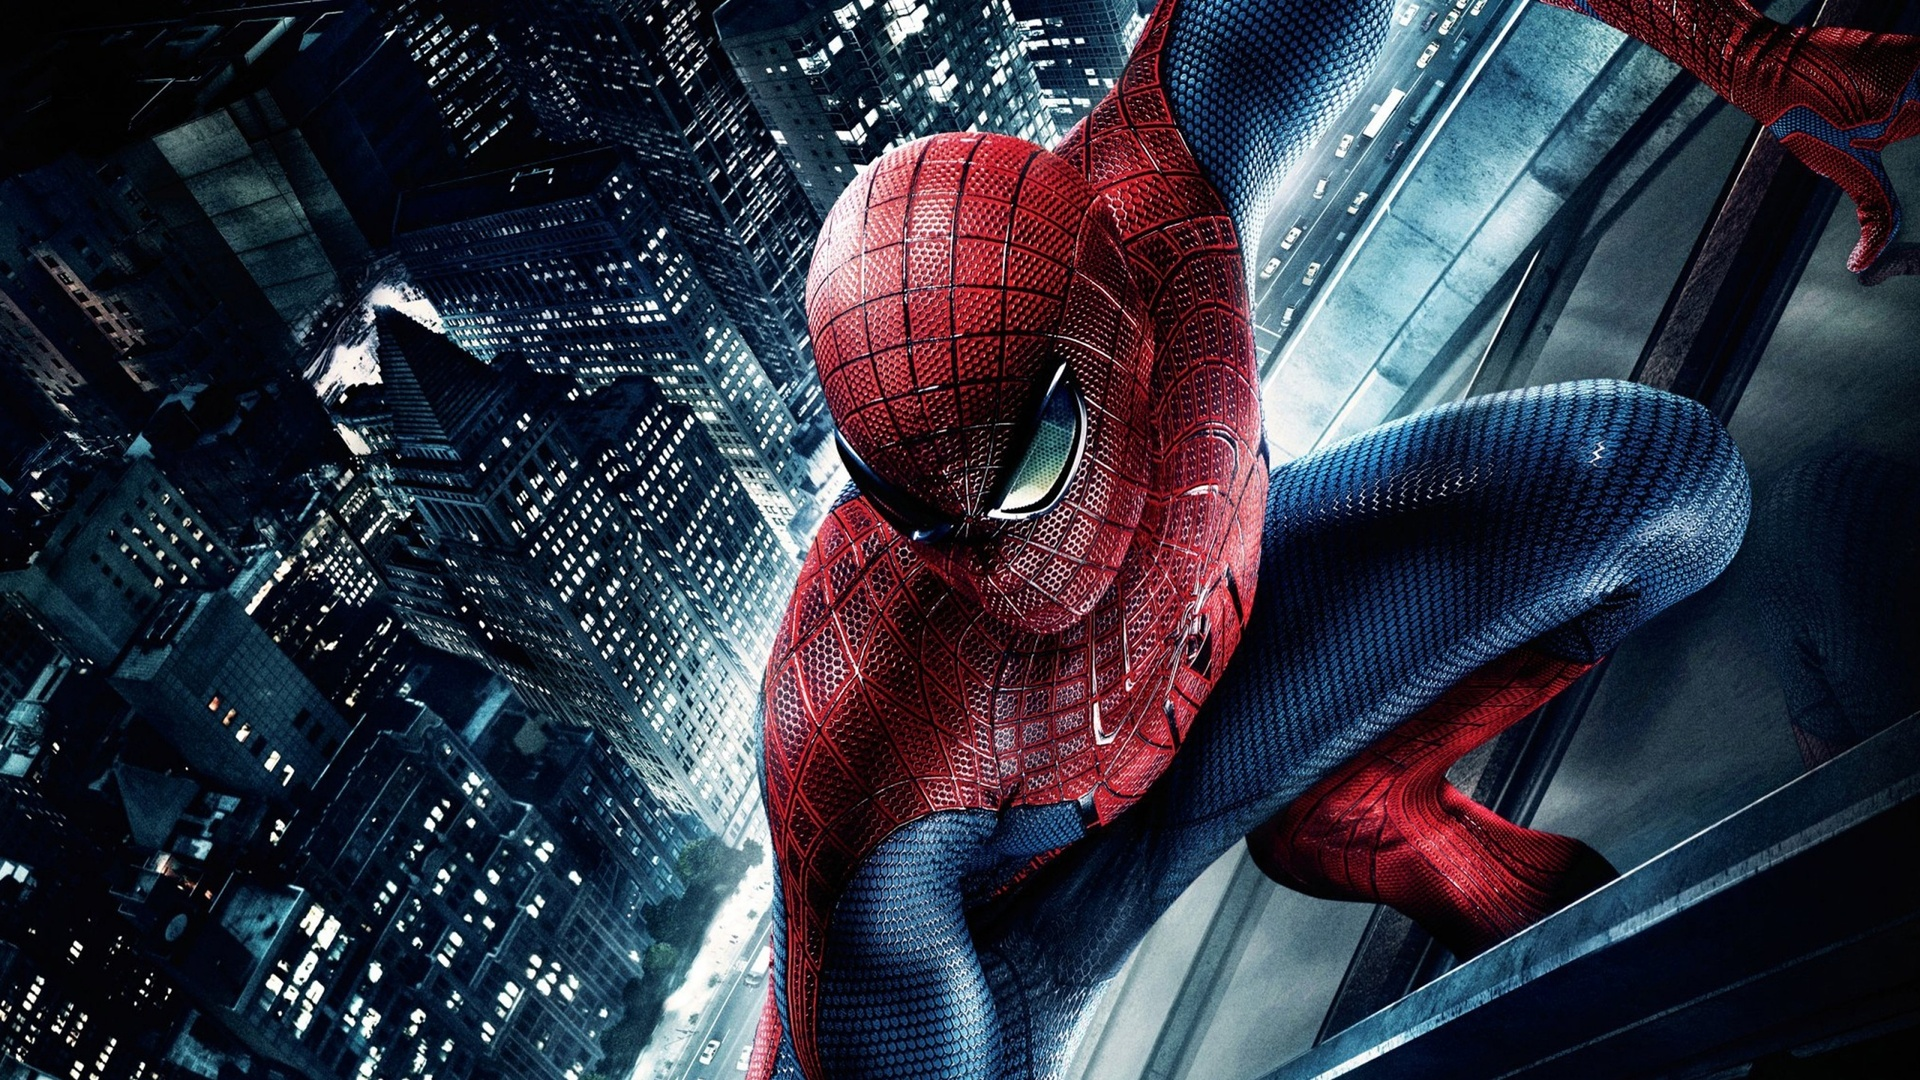 Spiderman-Wallpaper-2013